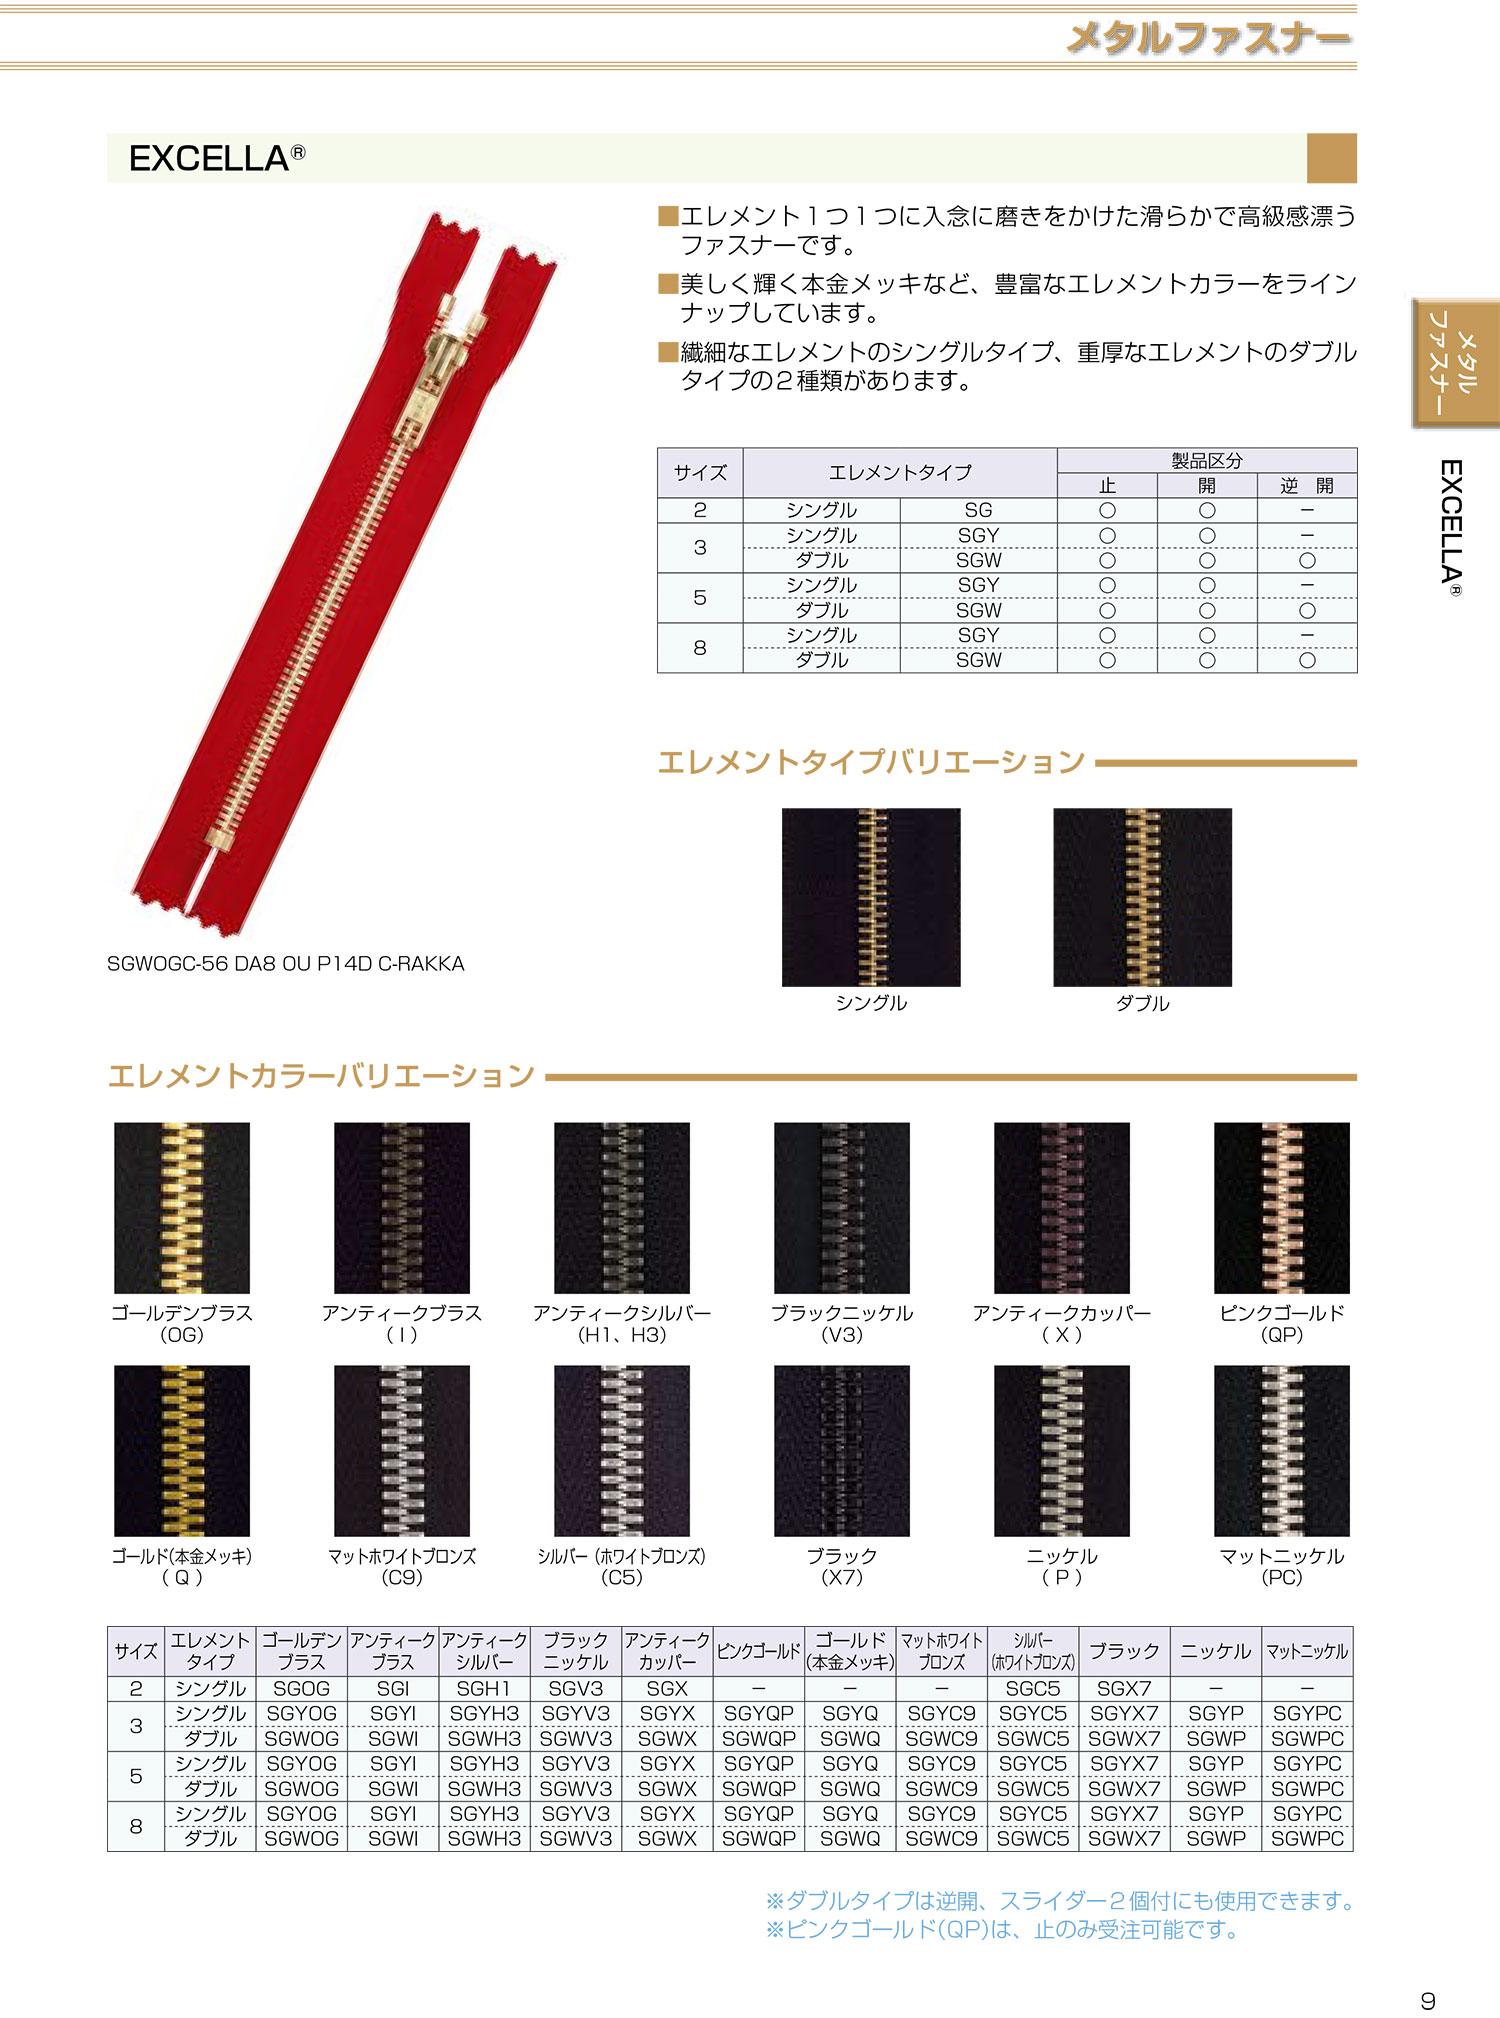 3SGWH3MR エクセラ 3サイズ アンティークシルバー 逆開 ダブル[ファスナー] YKK/オークラ商事 - ApparelX アパレル資材卸通販